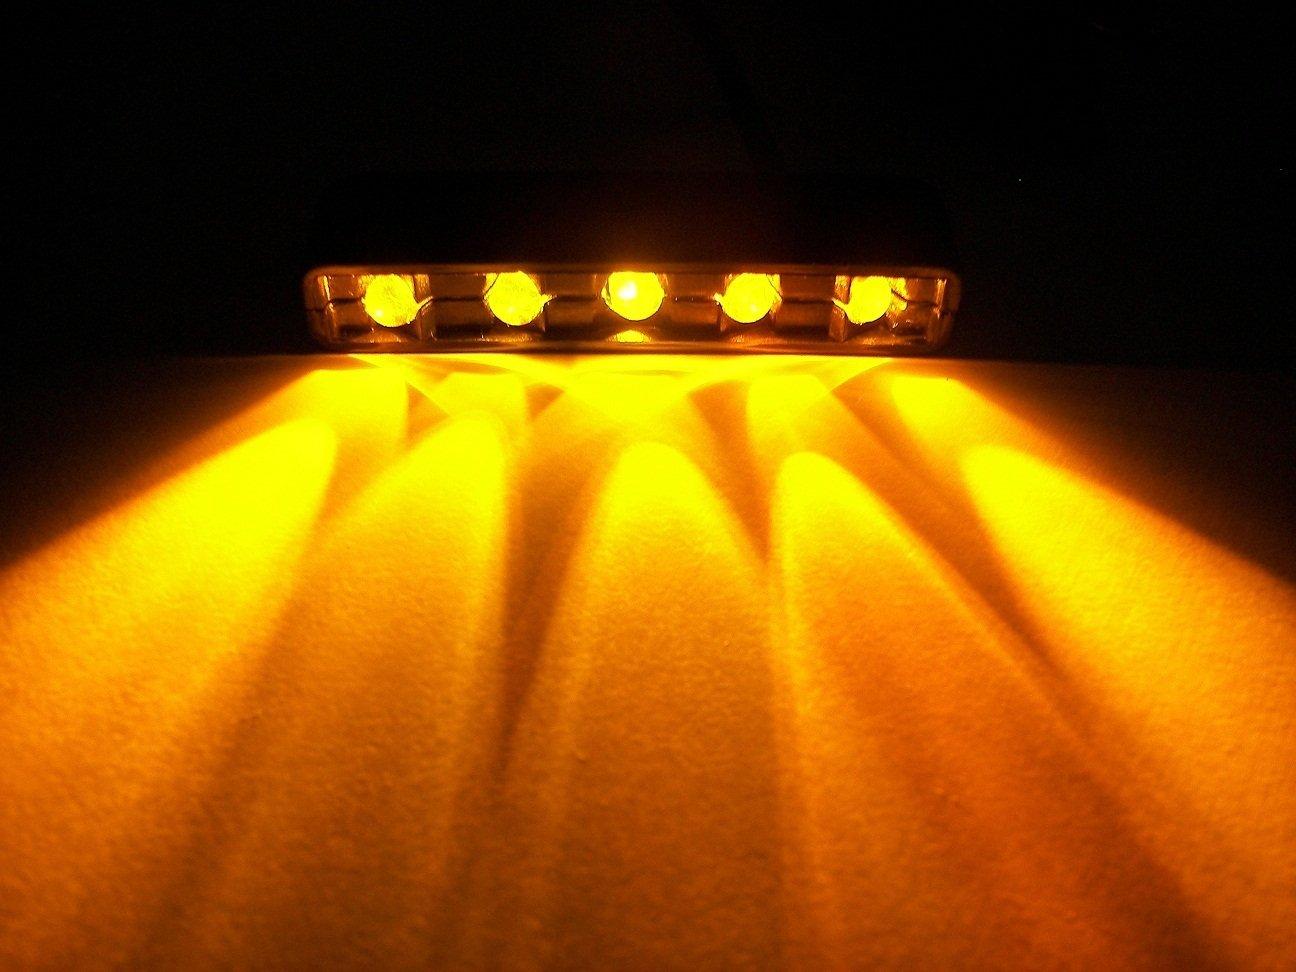 AMBER Orange 5 LED Chrome MOTORCYCLE CAR BOAT HOME POD ACCENT LIGHT BRIGHT 1